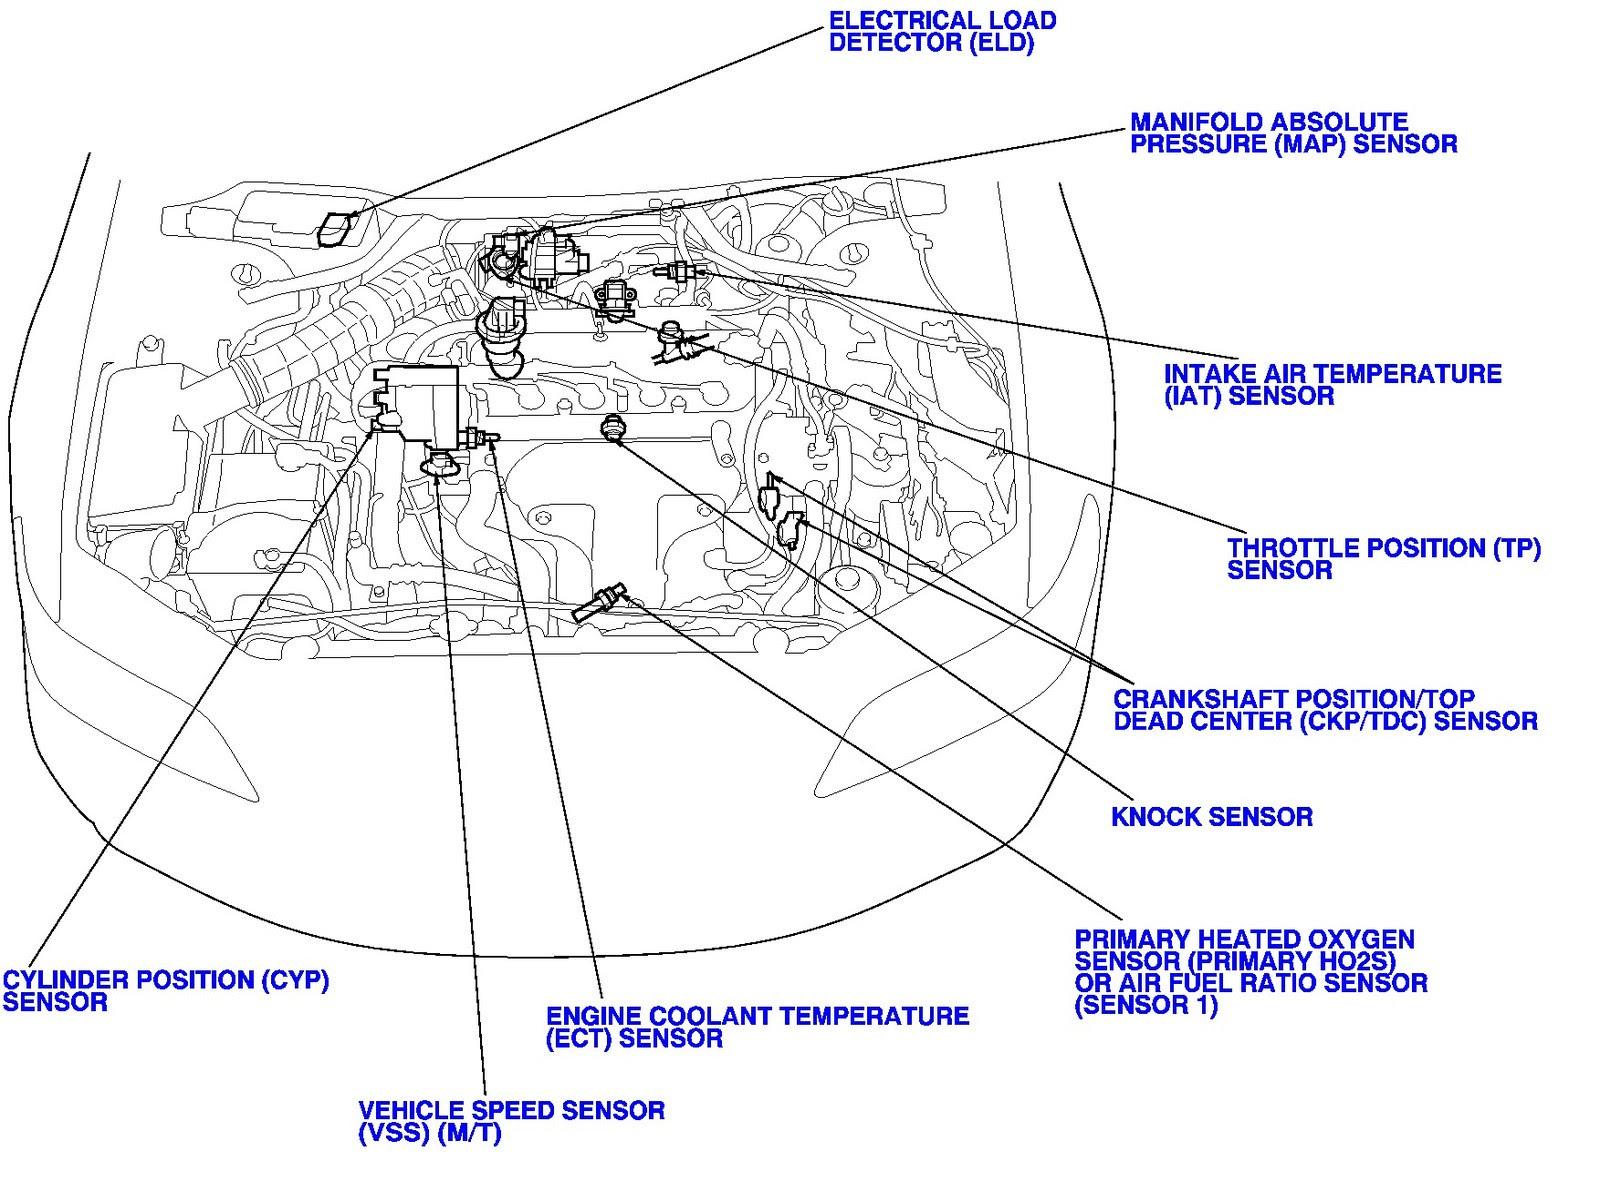 2000 Accord Engine Diagram Data Wiring Diagram State Greet State Greet Vivarelliauto It